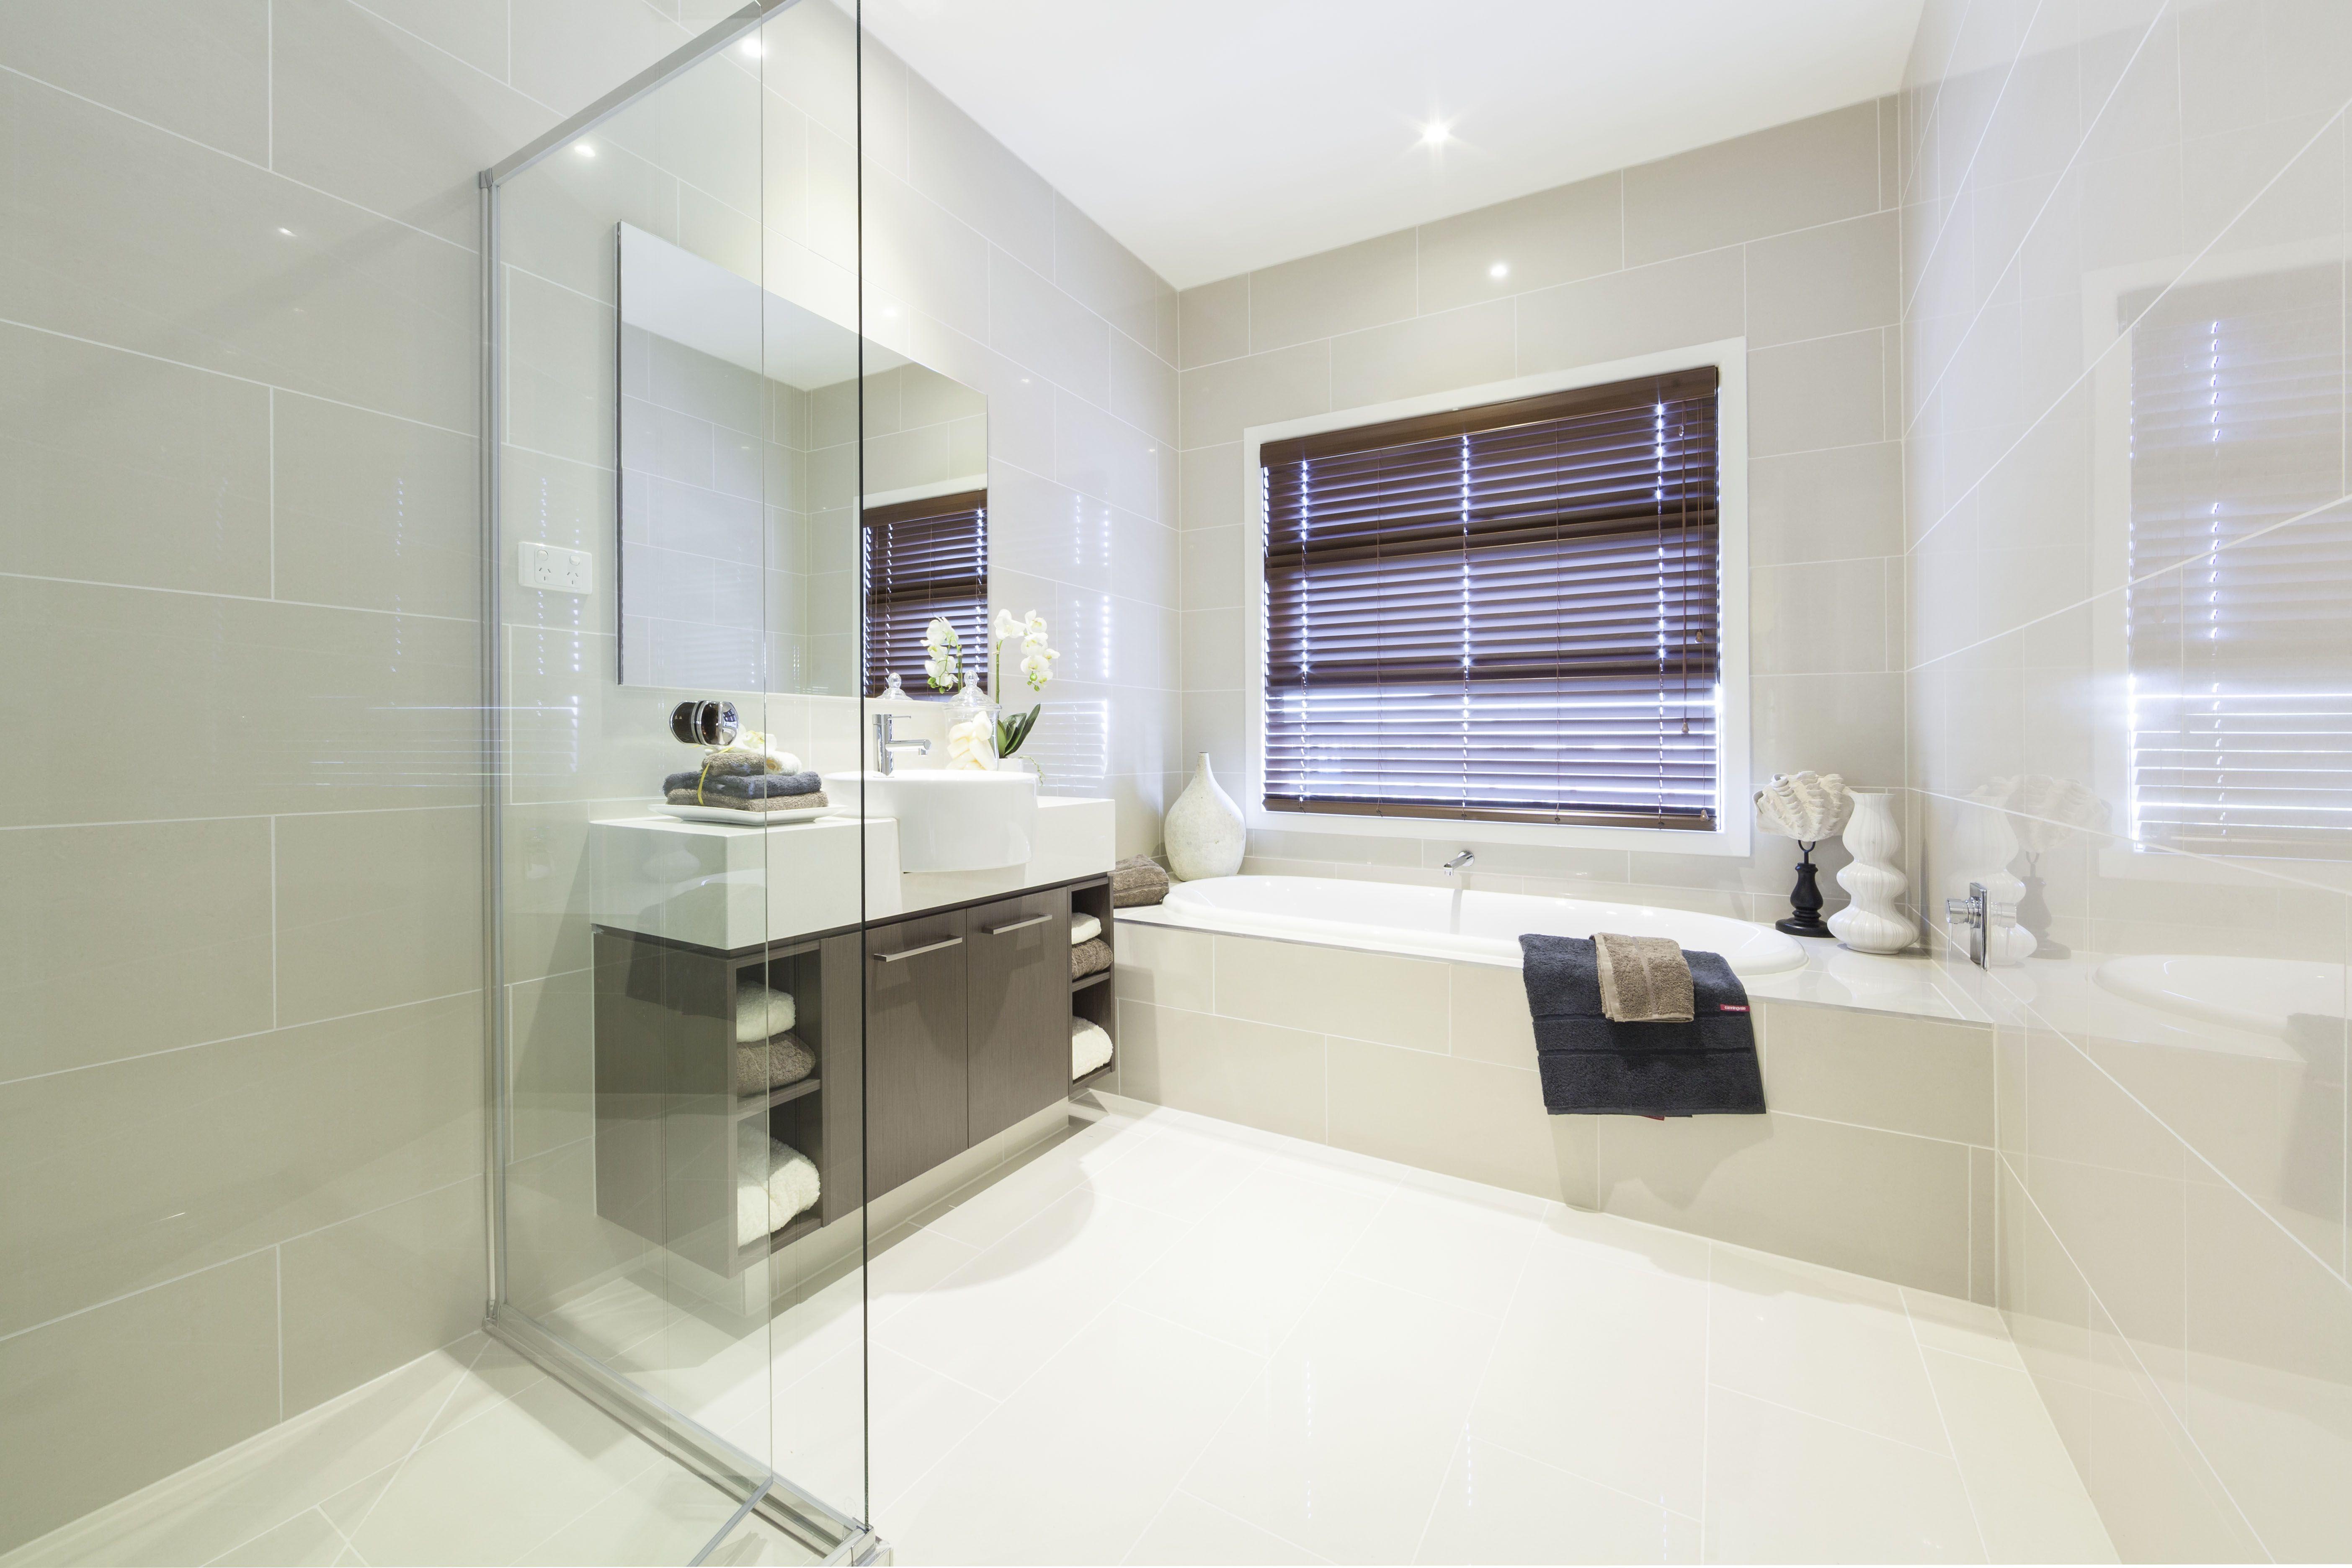 St Ives Bathroom by Simonds Homes #Woodleaestate #Simondshomes #land ...